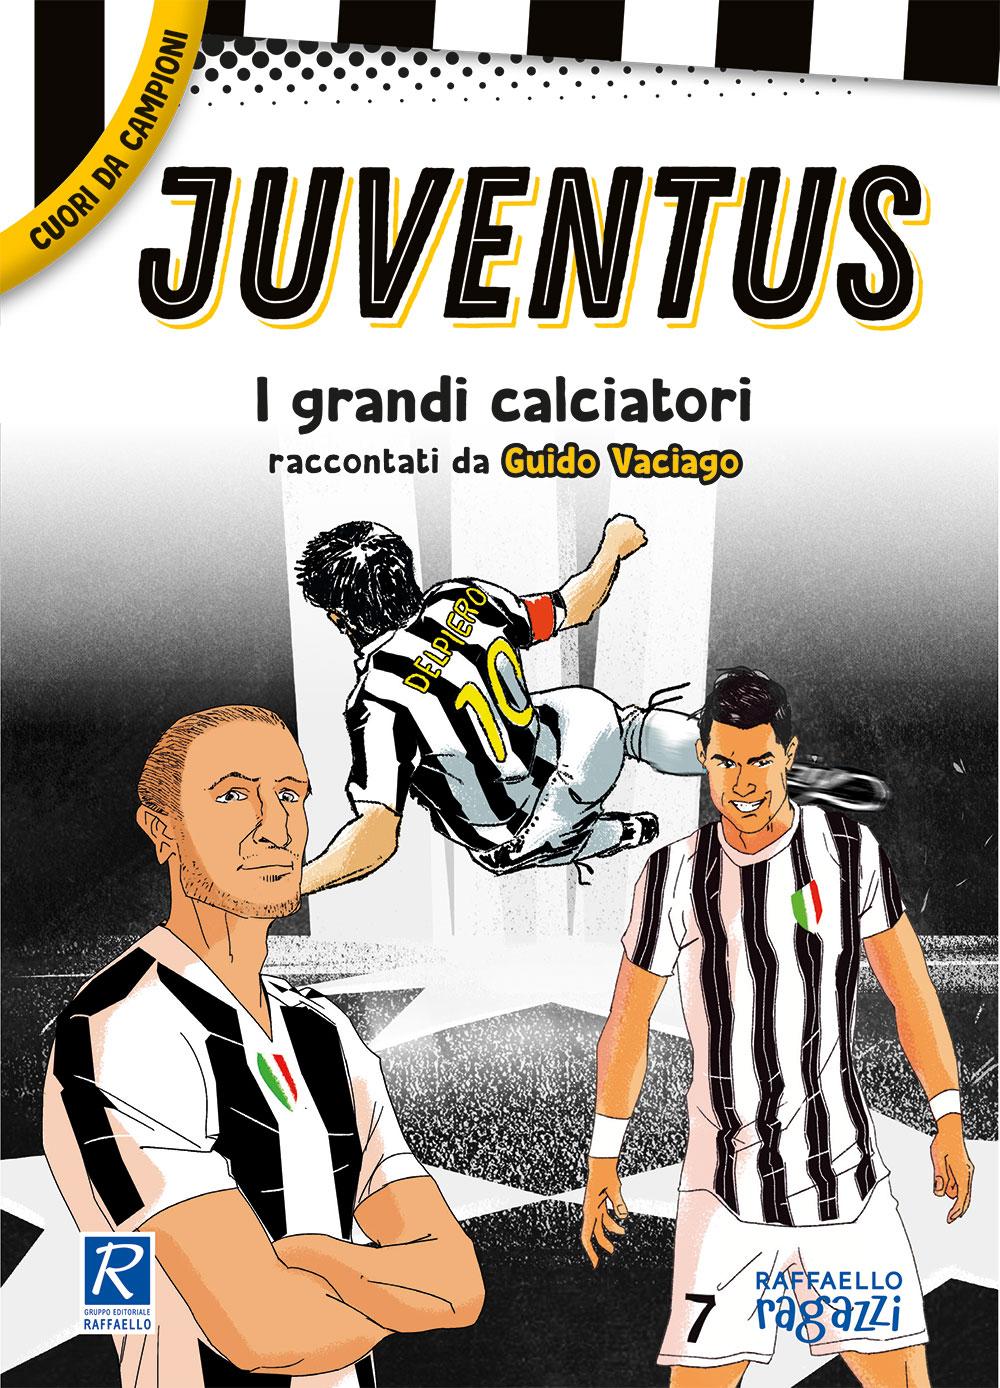 Cuori da campioni - Juventus